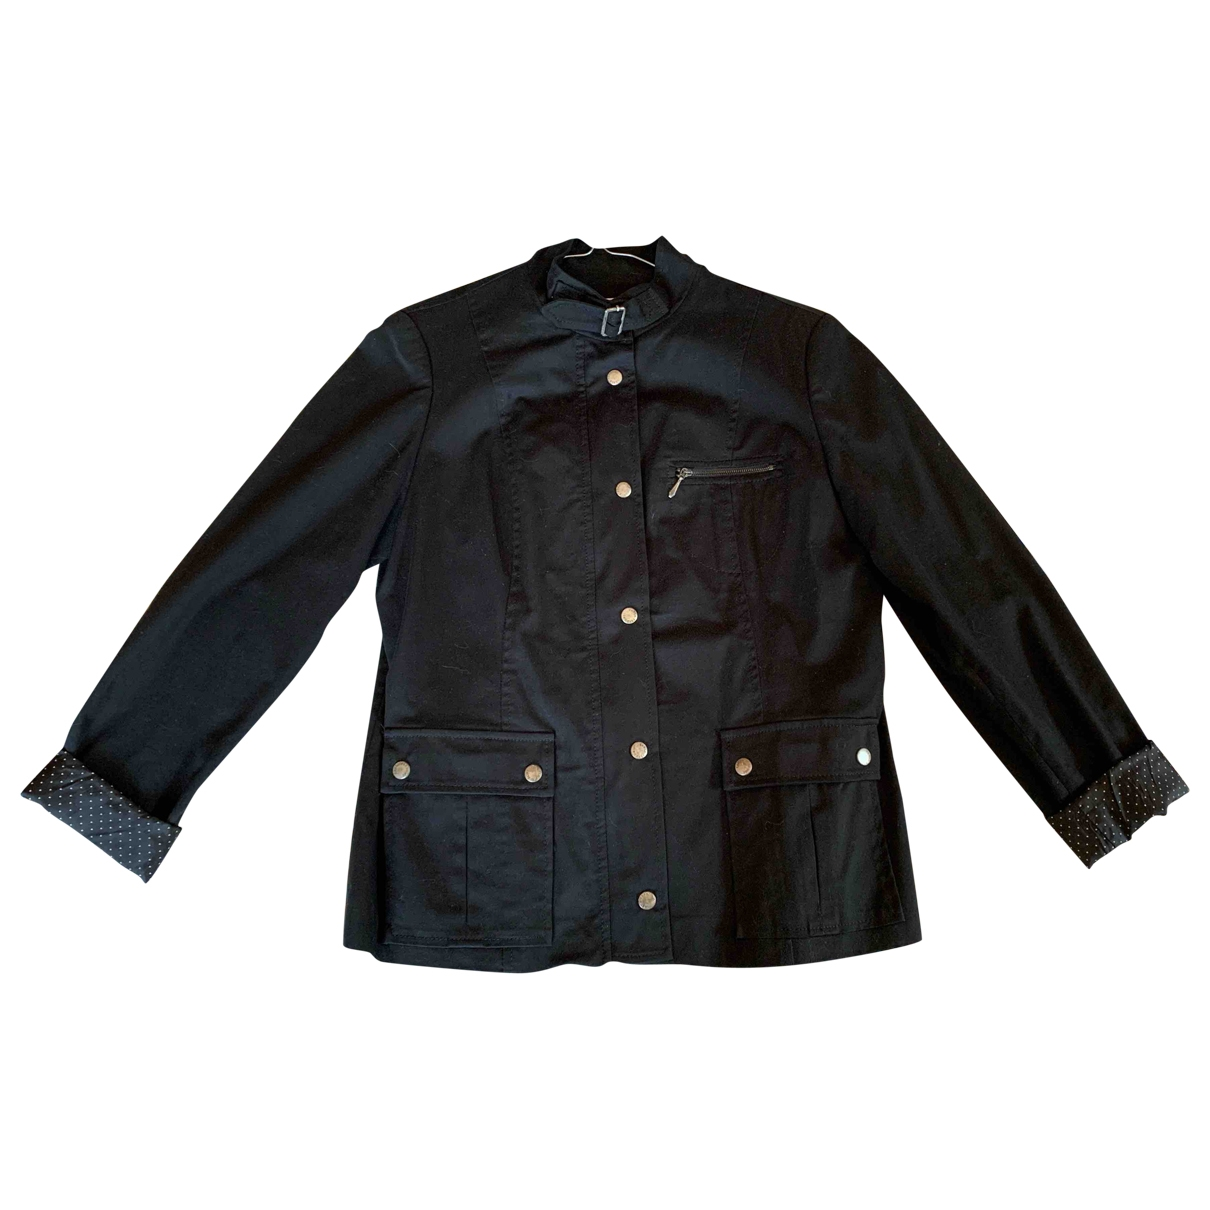 Lady Jean \N Black Cotton jacket for Women M International